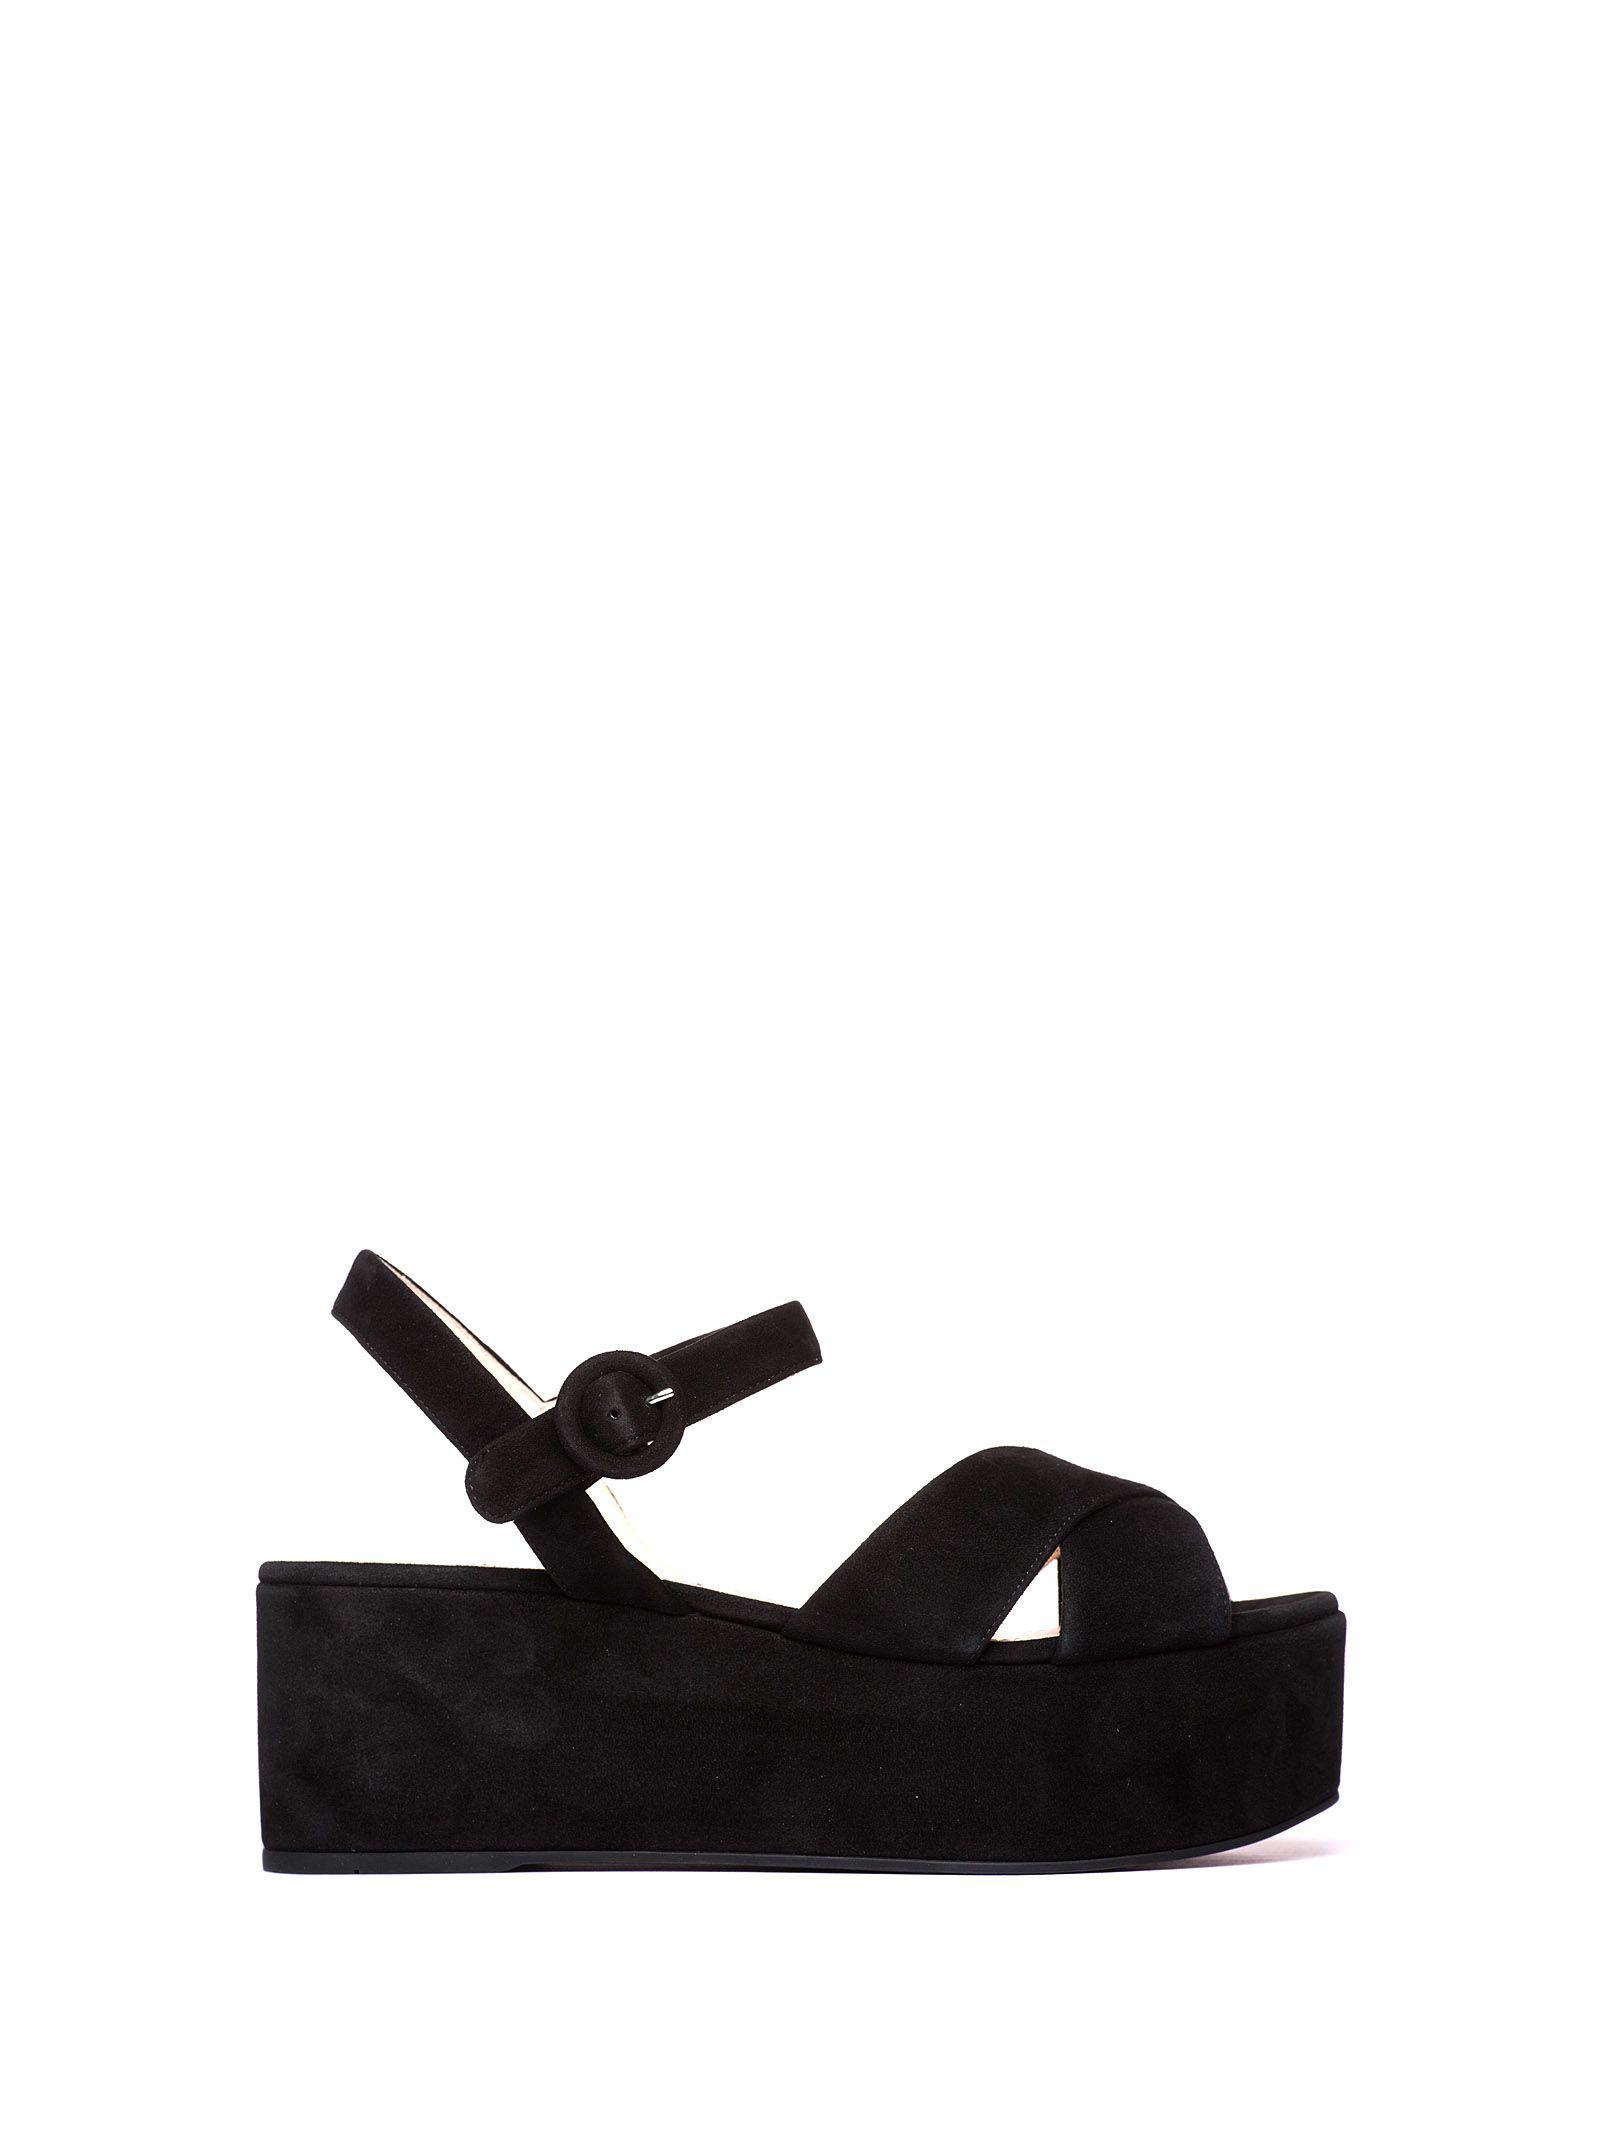 ea6a3f85436 Prada Suede Wedge Platform Sandals In Black